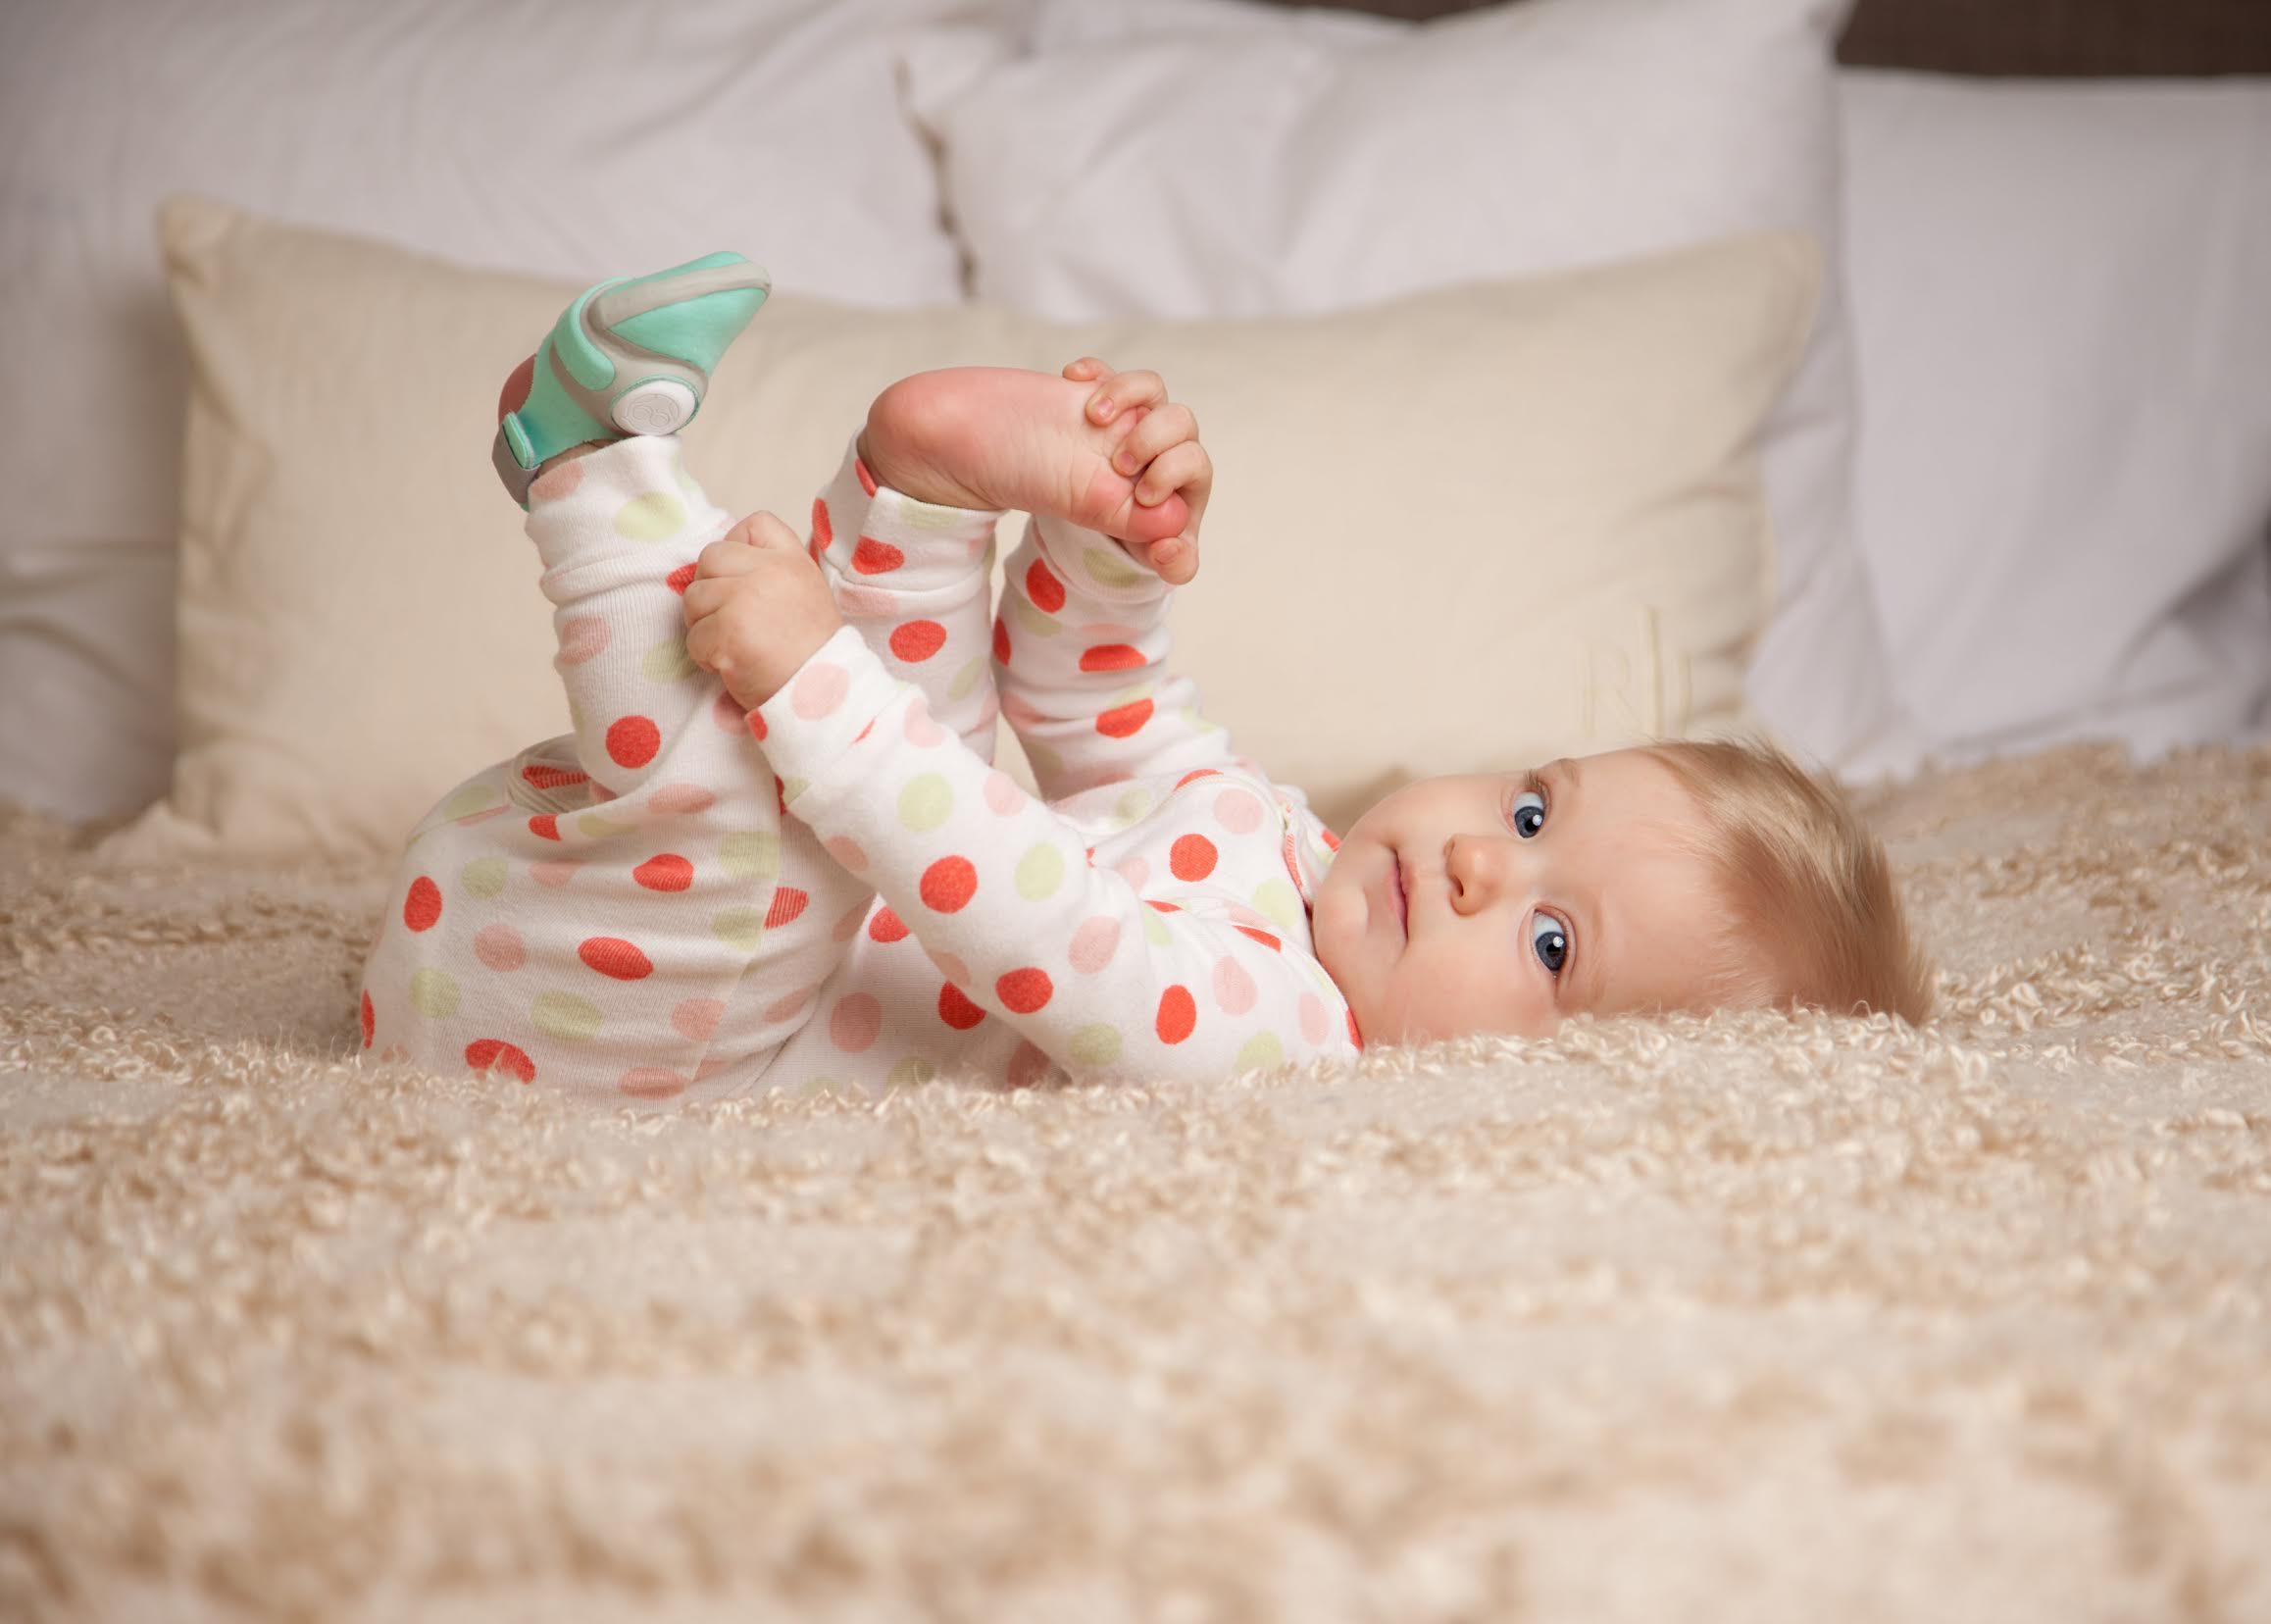 Owlet The Smart Baby Bootie Raises $7 Million Series A